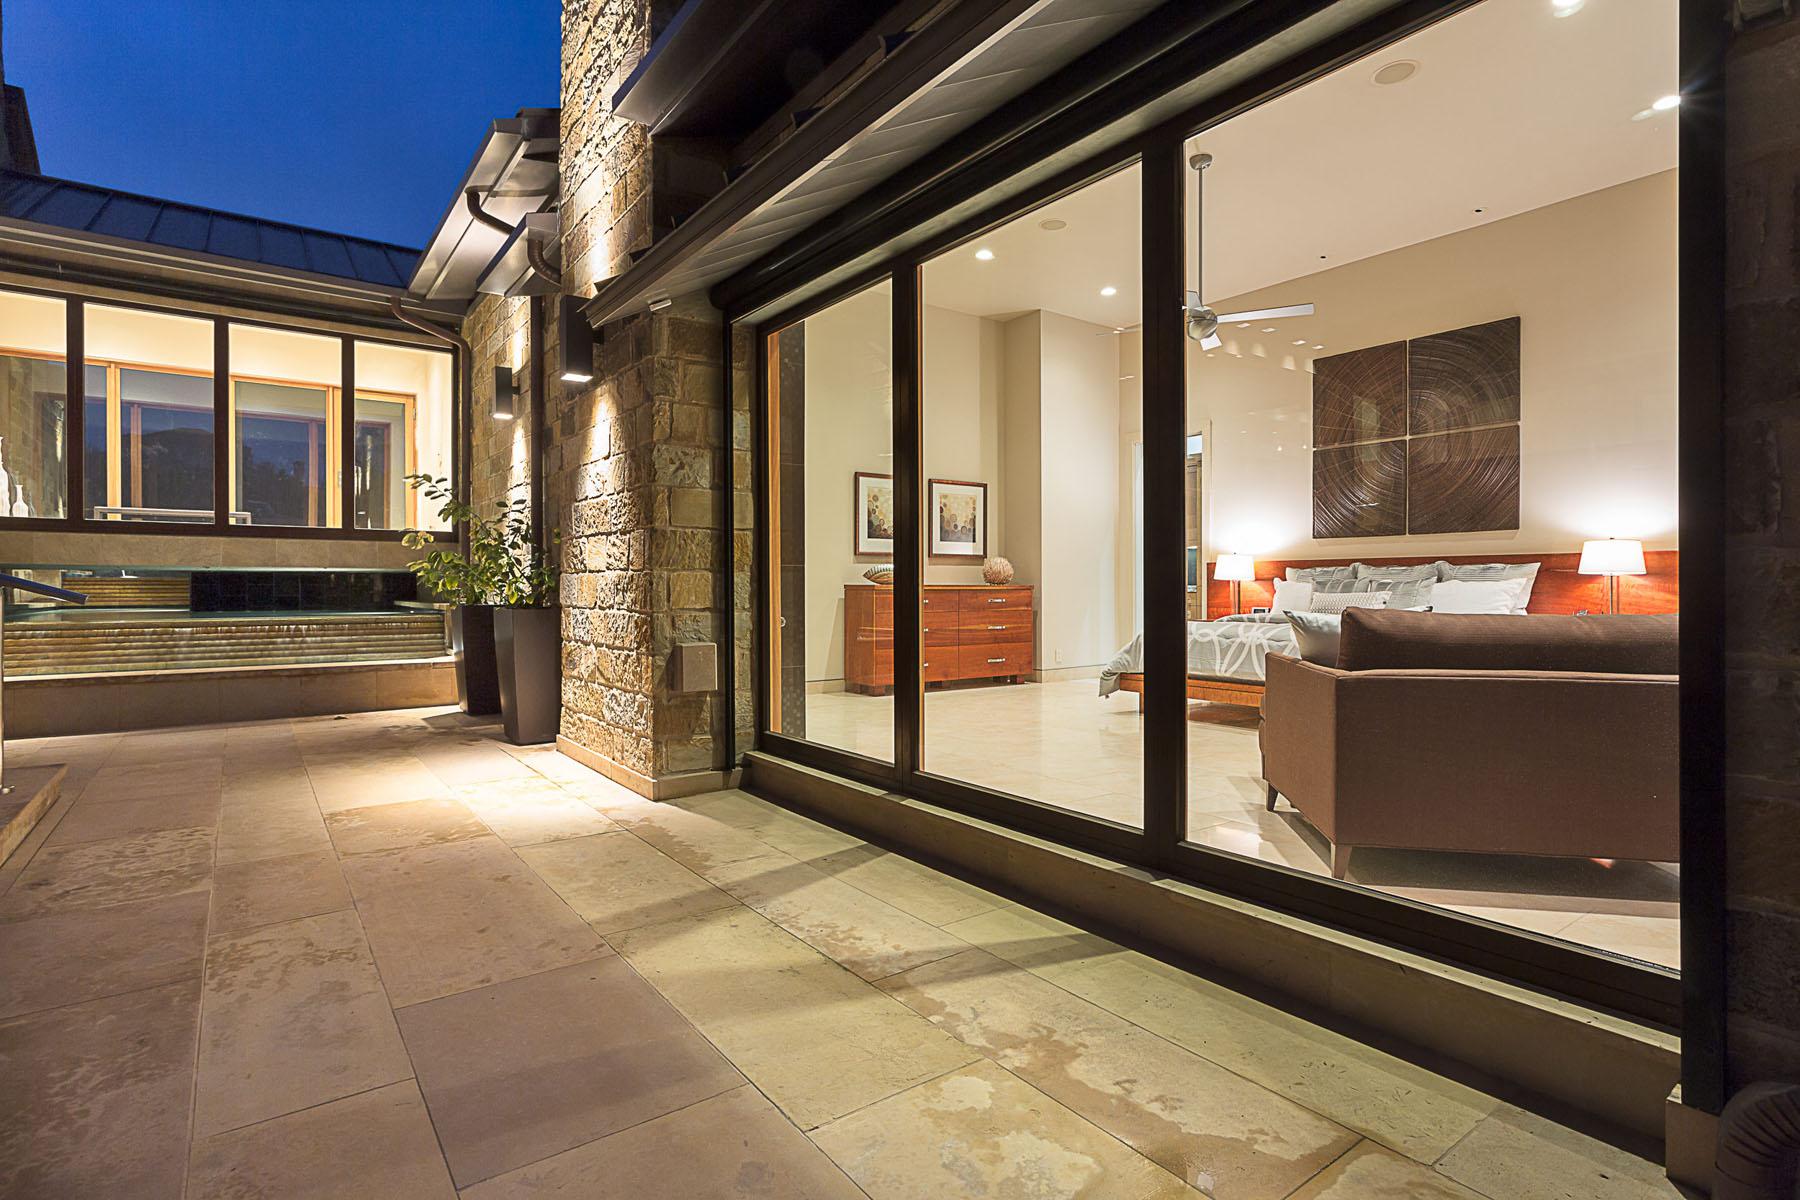 Additional photo for property listing at 5221 Musket Cv, Austin  Austin, Texas 78738 Estados Unidos